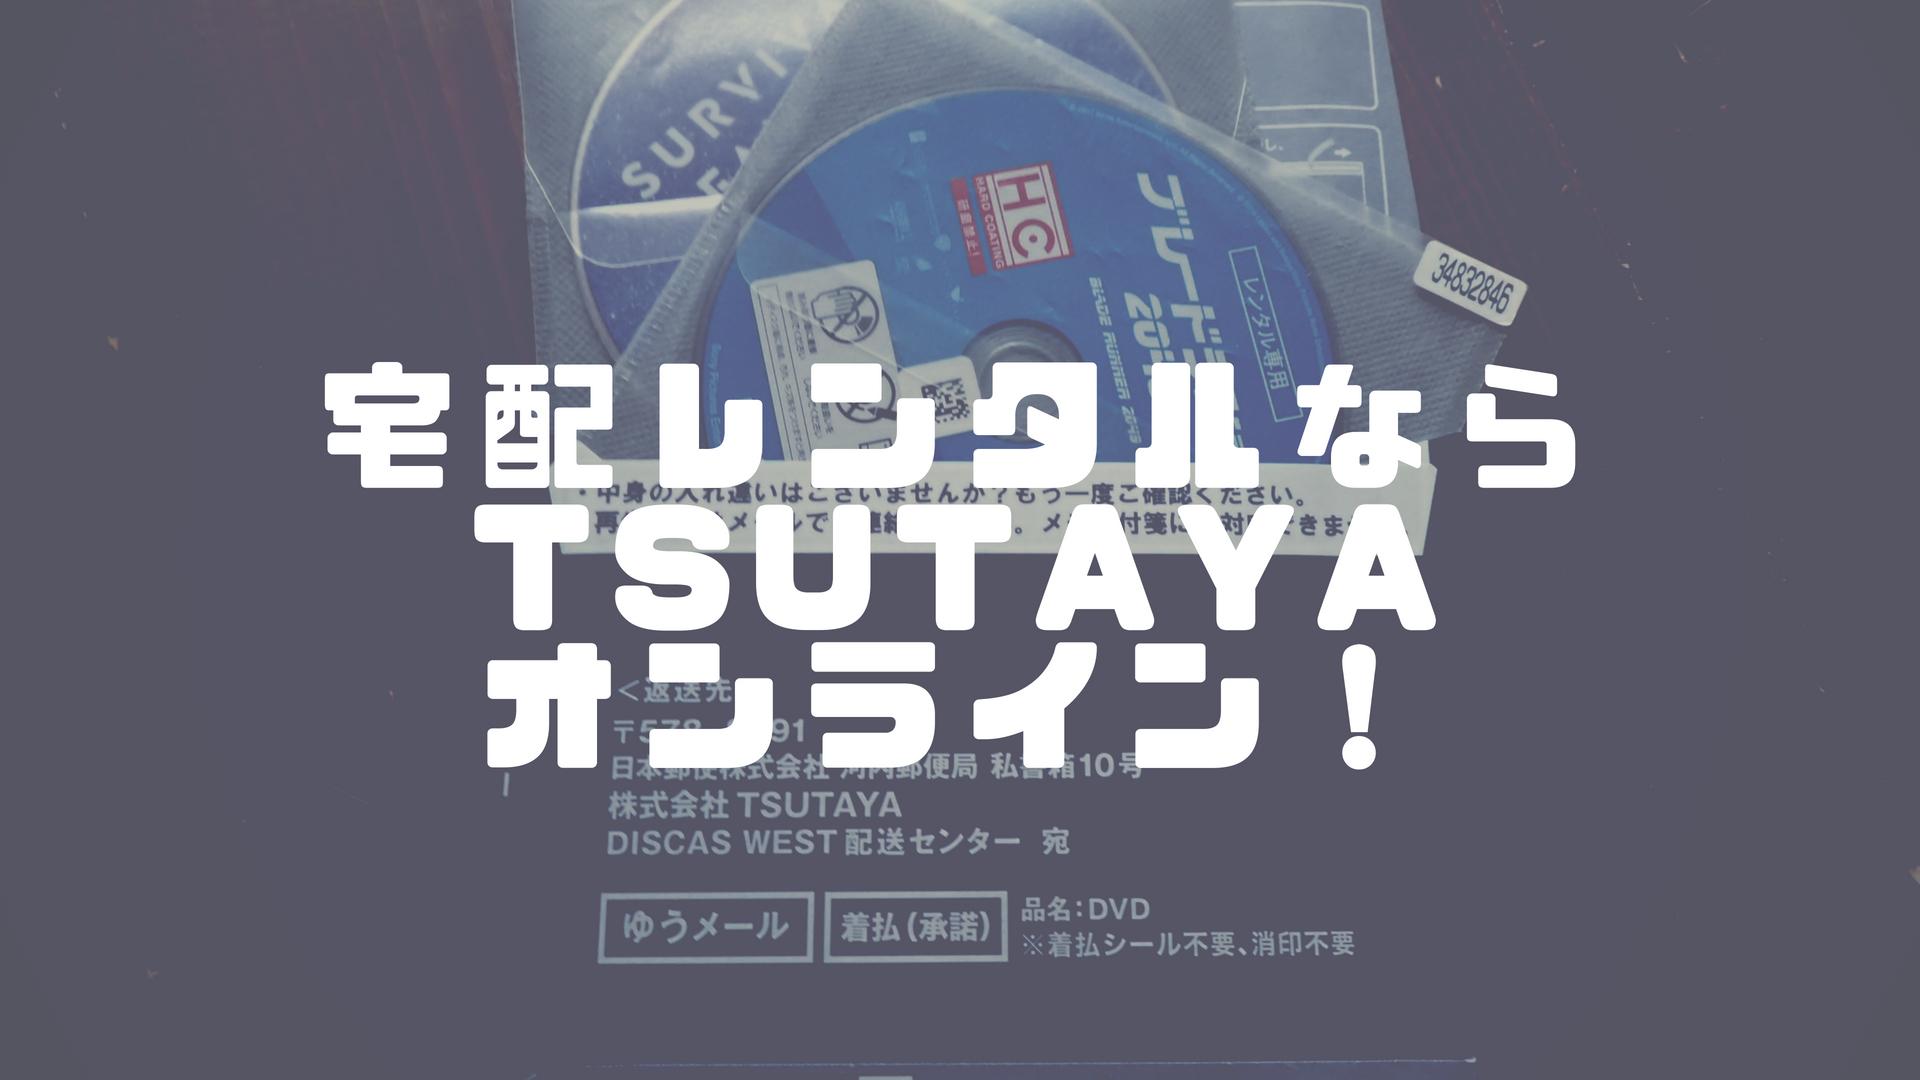 tsutaya online